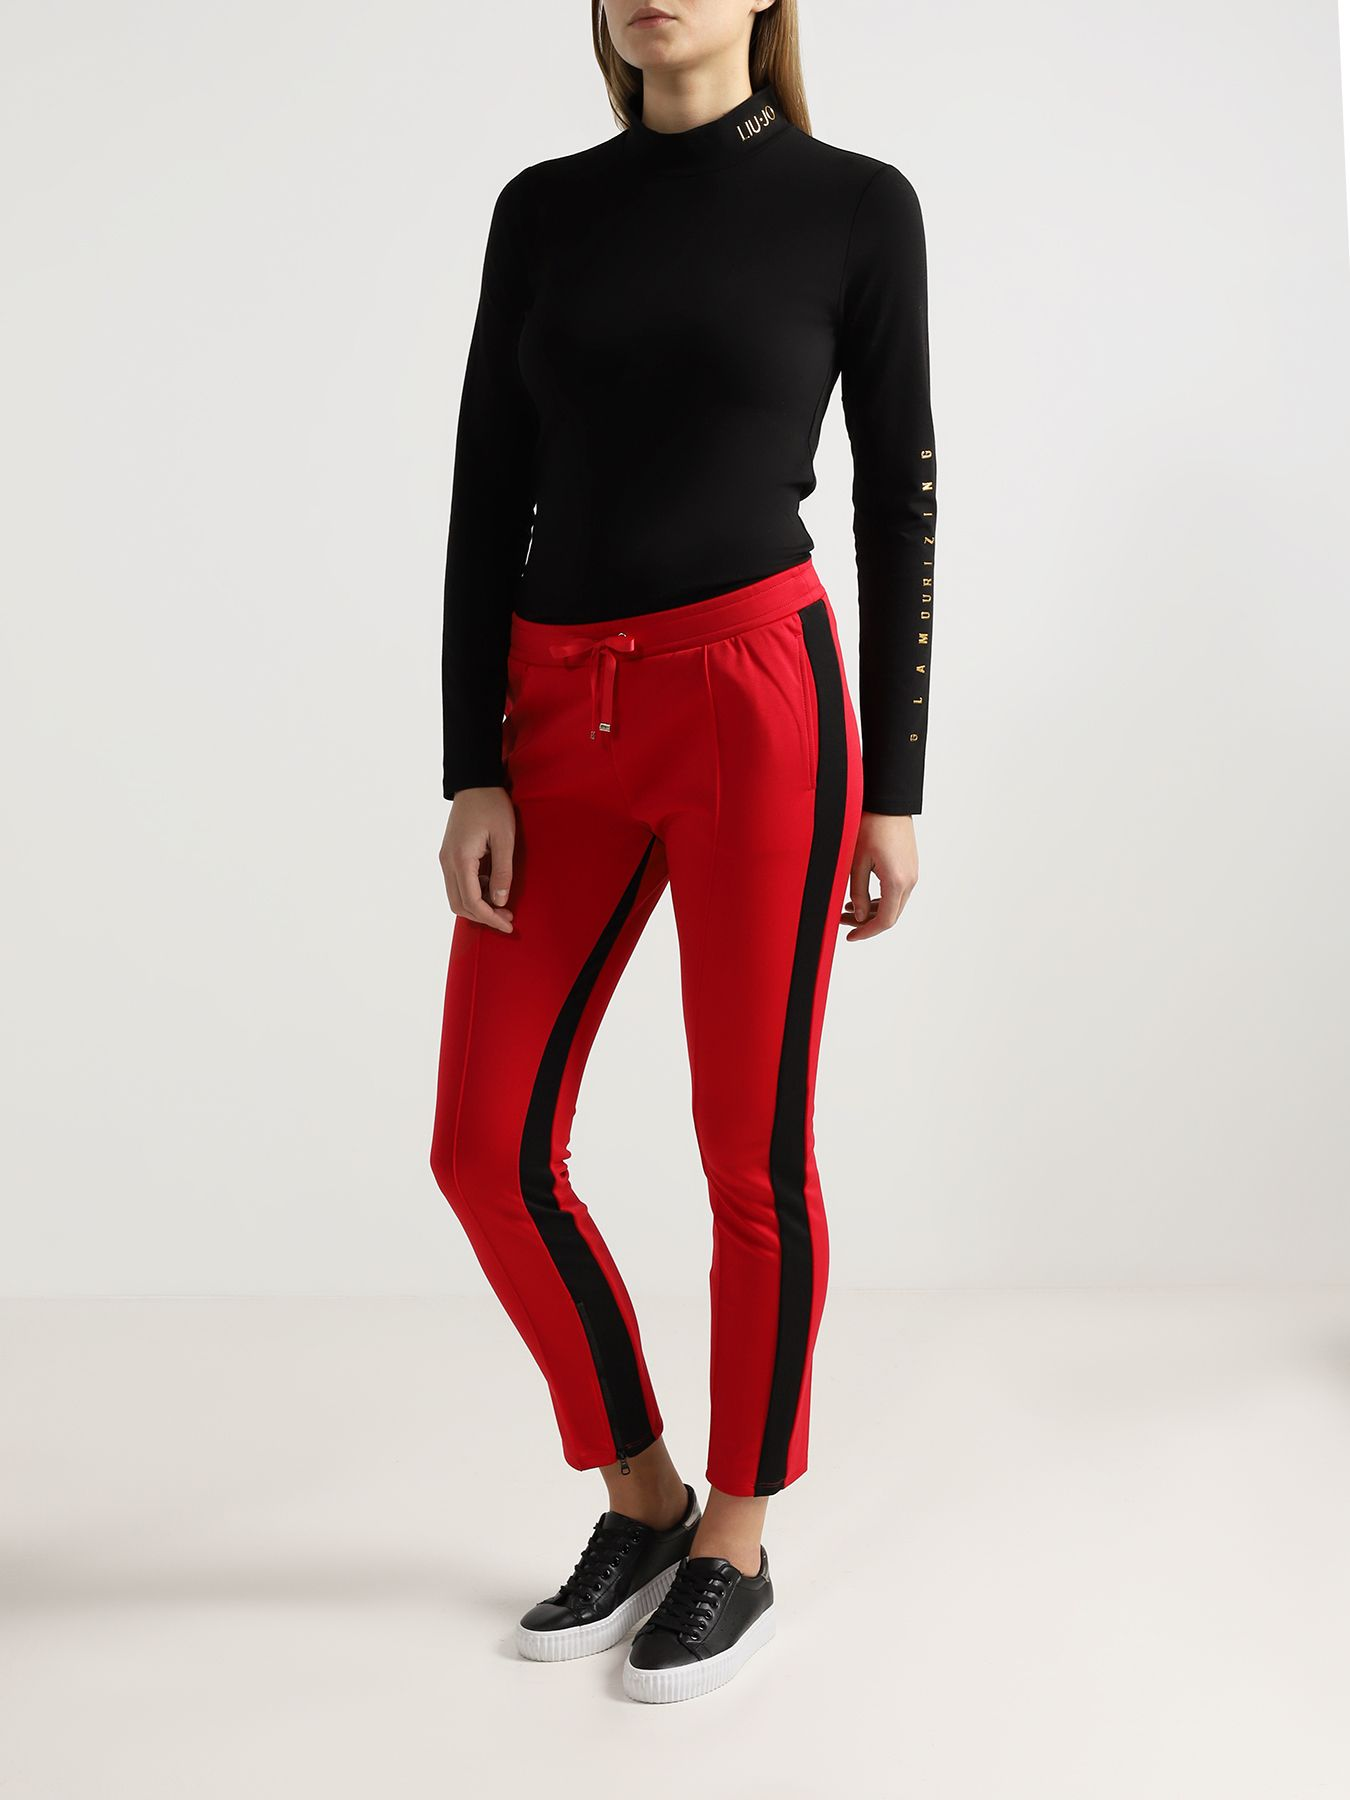 Брюки Liu Jo Sport Узкие брюки брюки узкие cassis